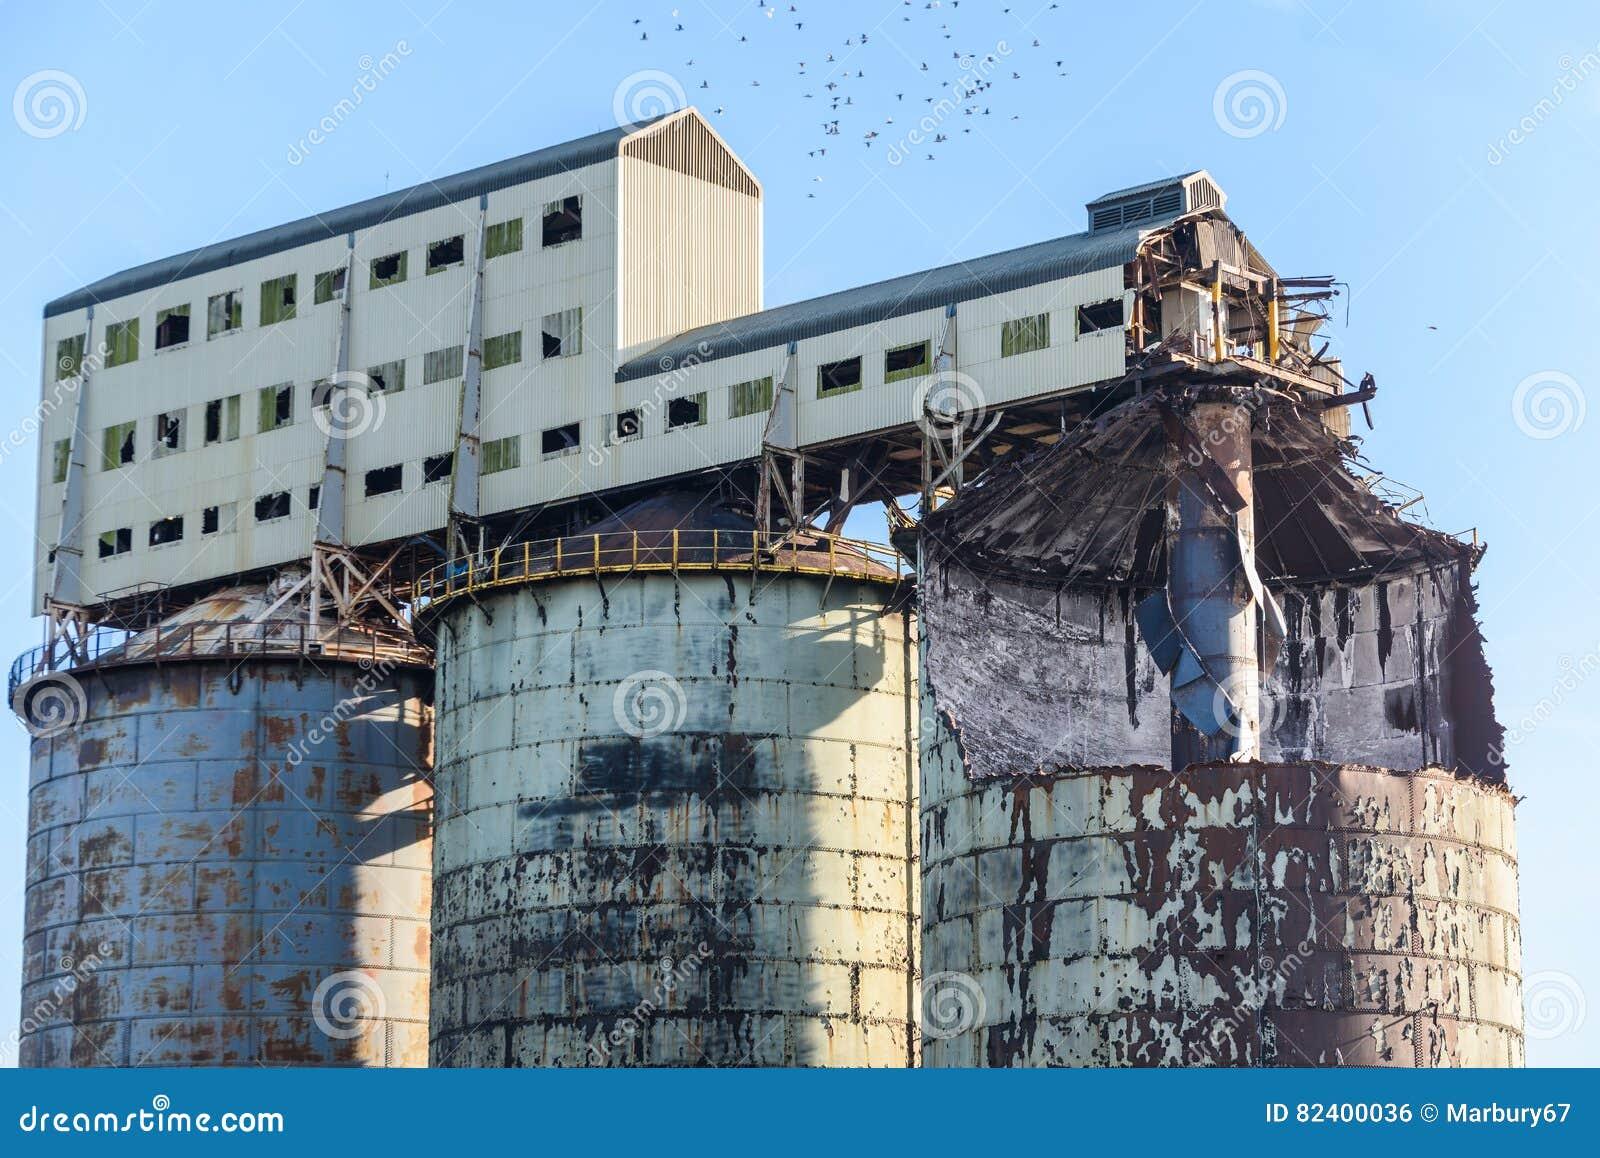 Industrial Ruin stock photo  Image of metal, environmental - 82400036